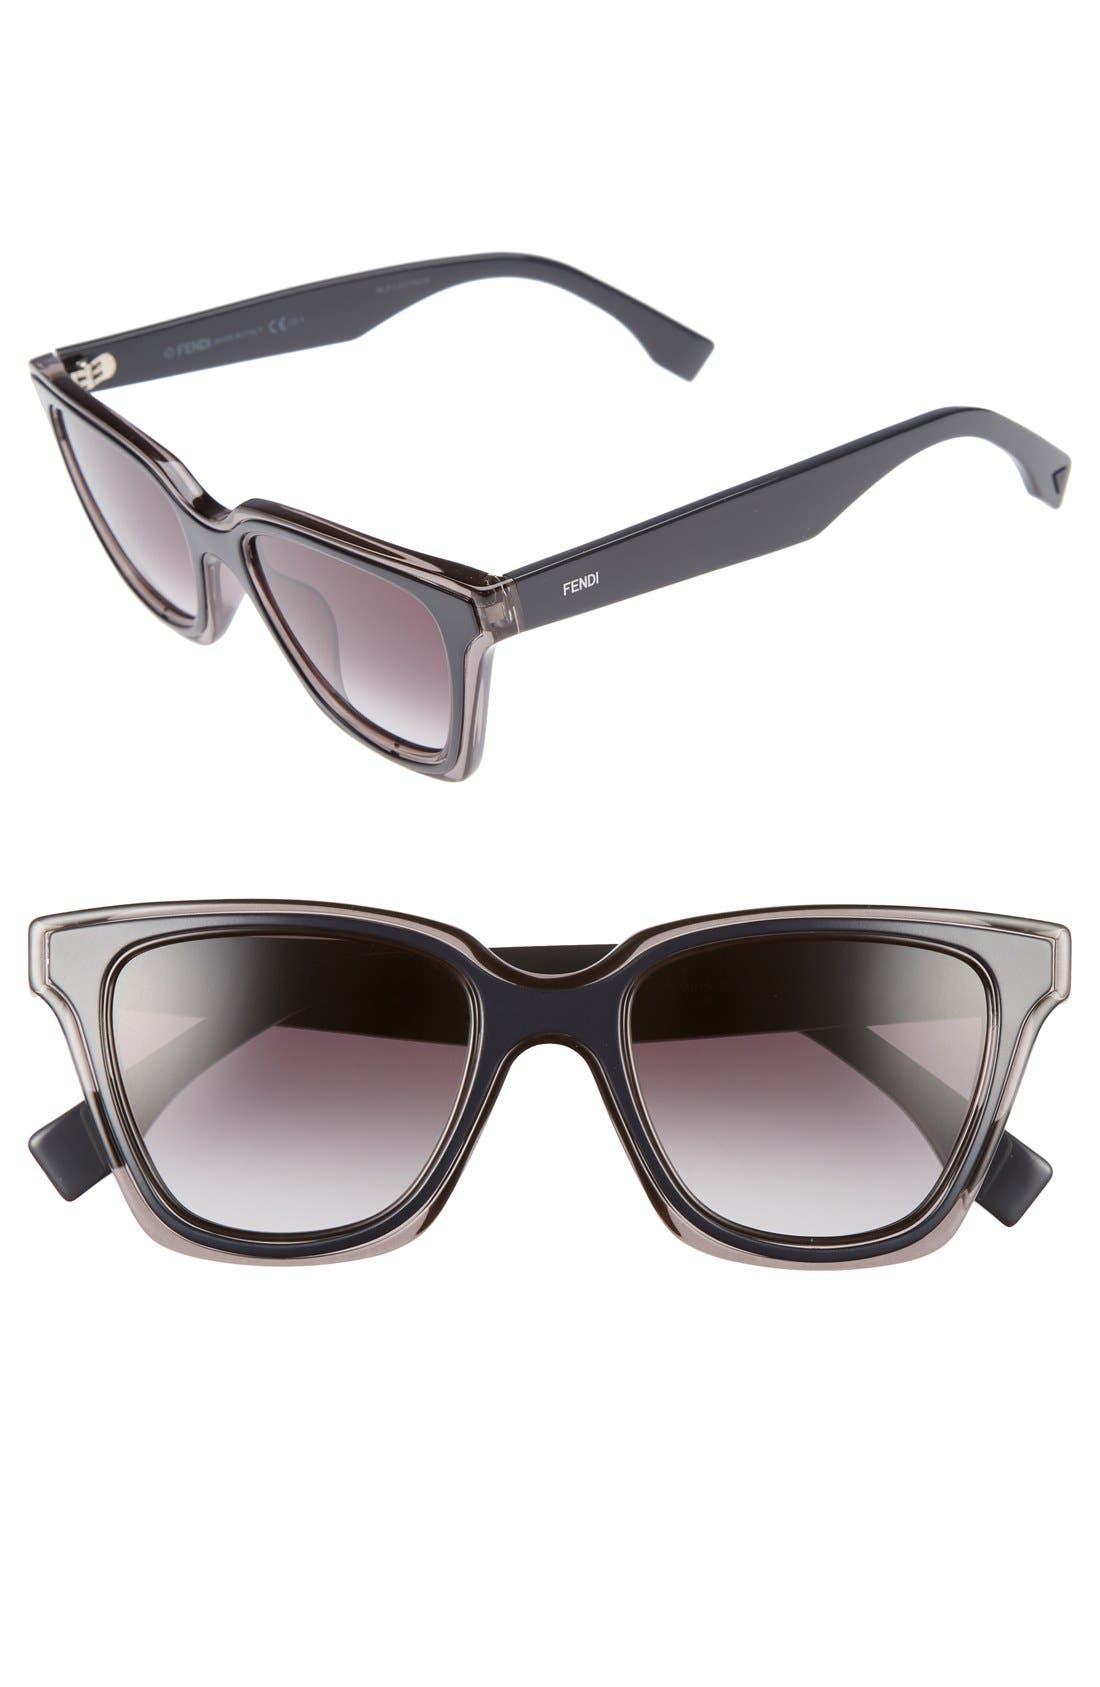 Be You 50mm Gradient Sunglasses,                             Main thumbnail 1, color,                             020